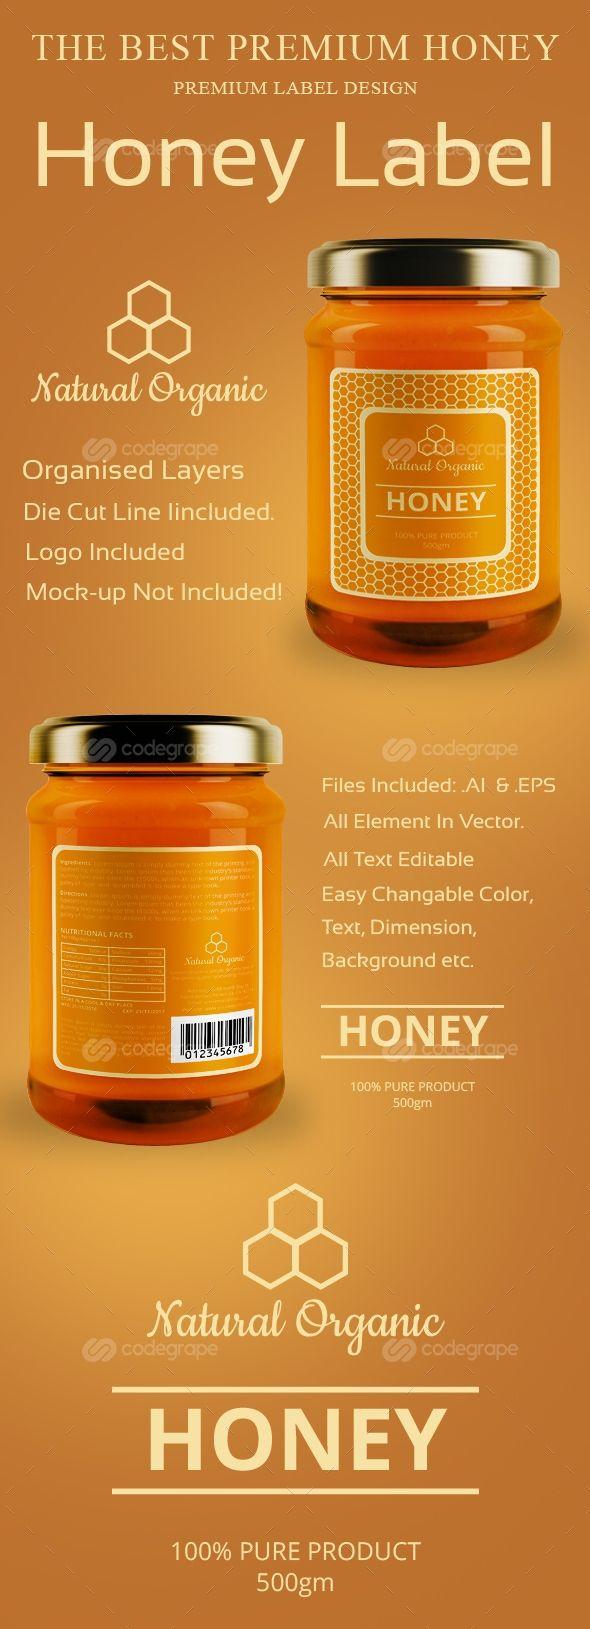 The 25 best ideas about Honey Label – Label Design Templates